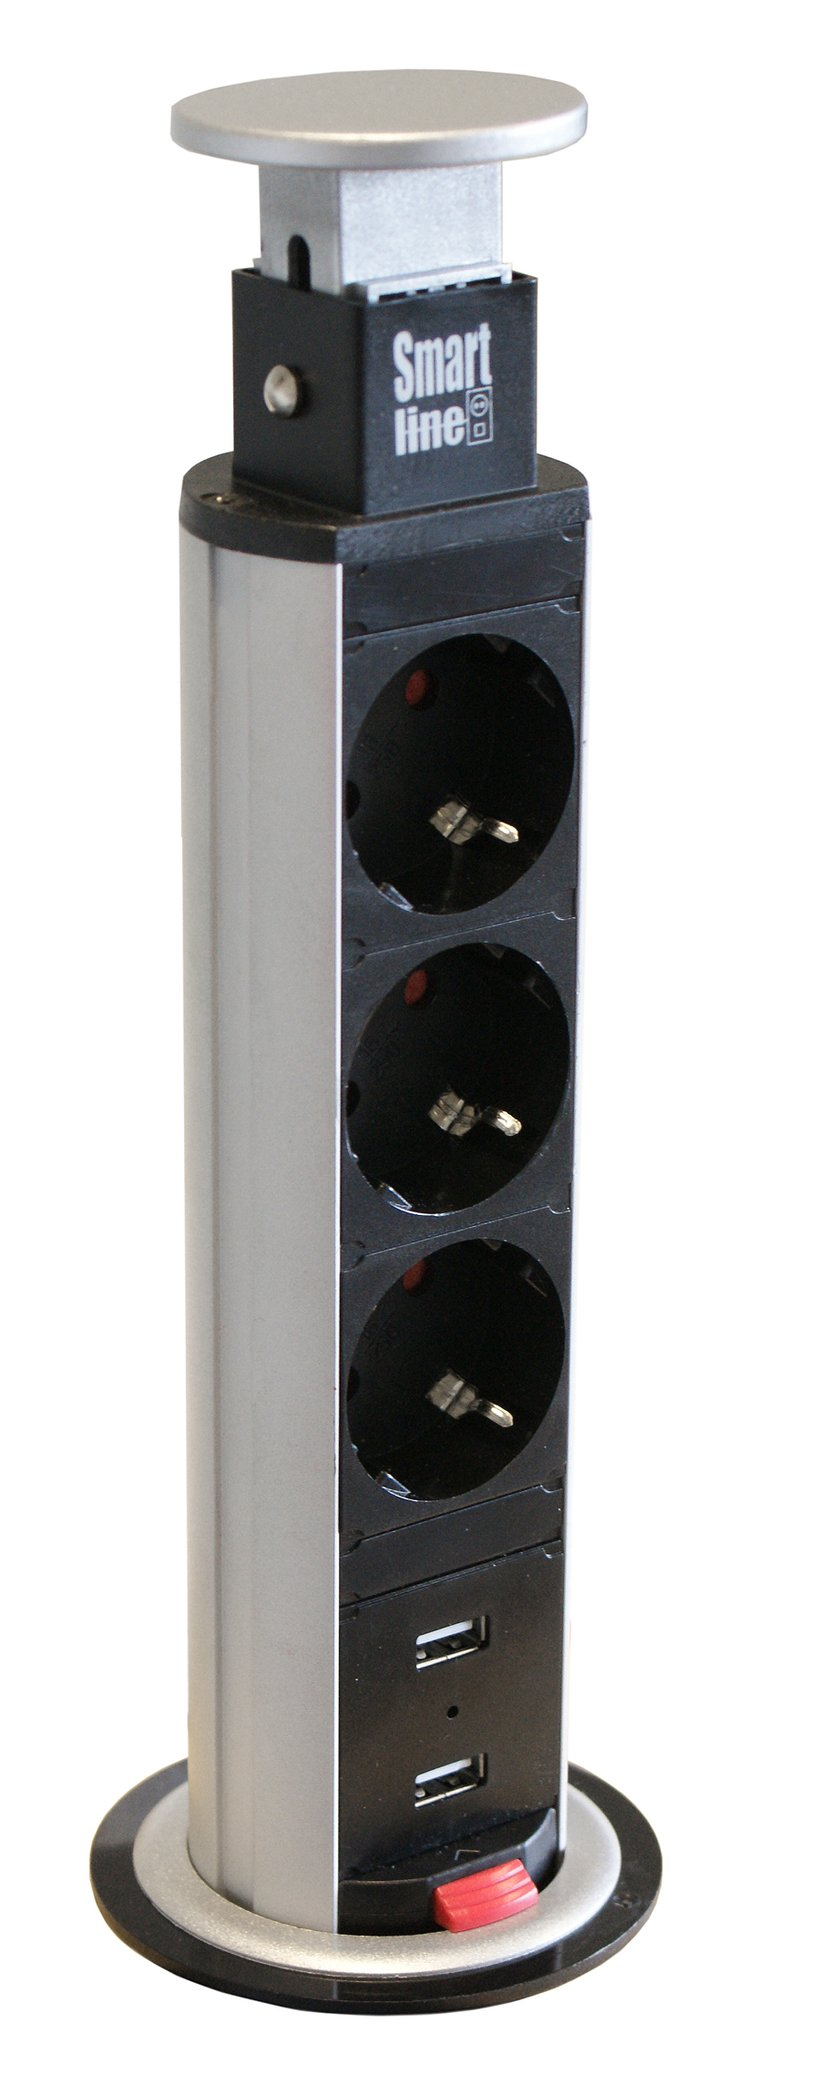 Kondator Smartline Popup Jack 3Xcee 7/4/2xUSB, 1,5m Kabel, Svart/Silver